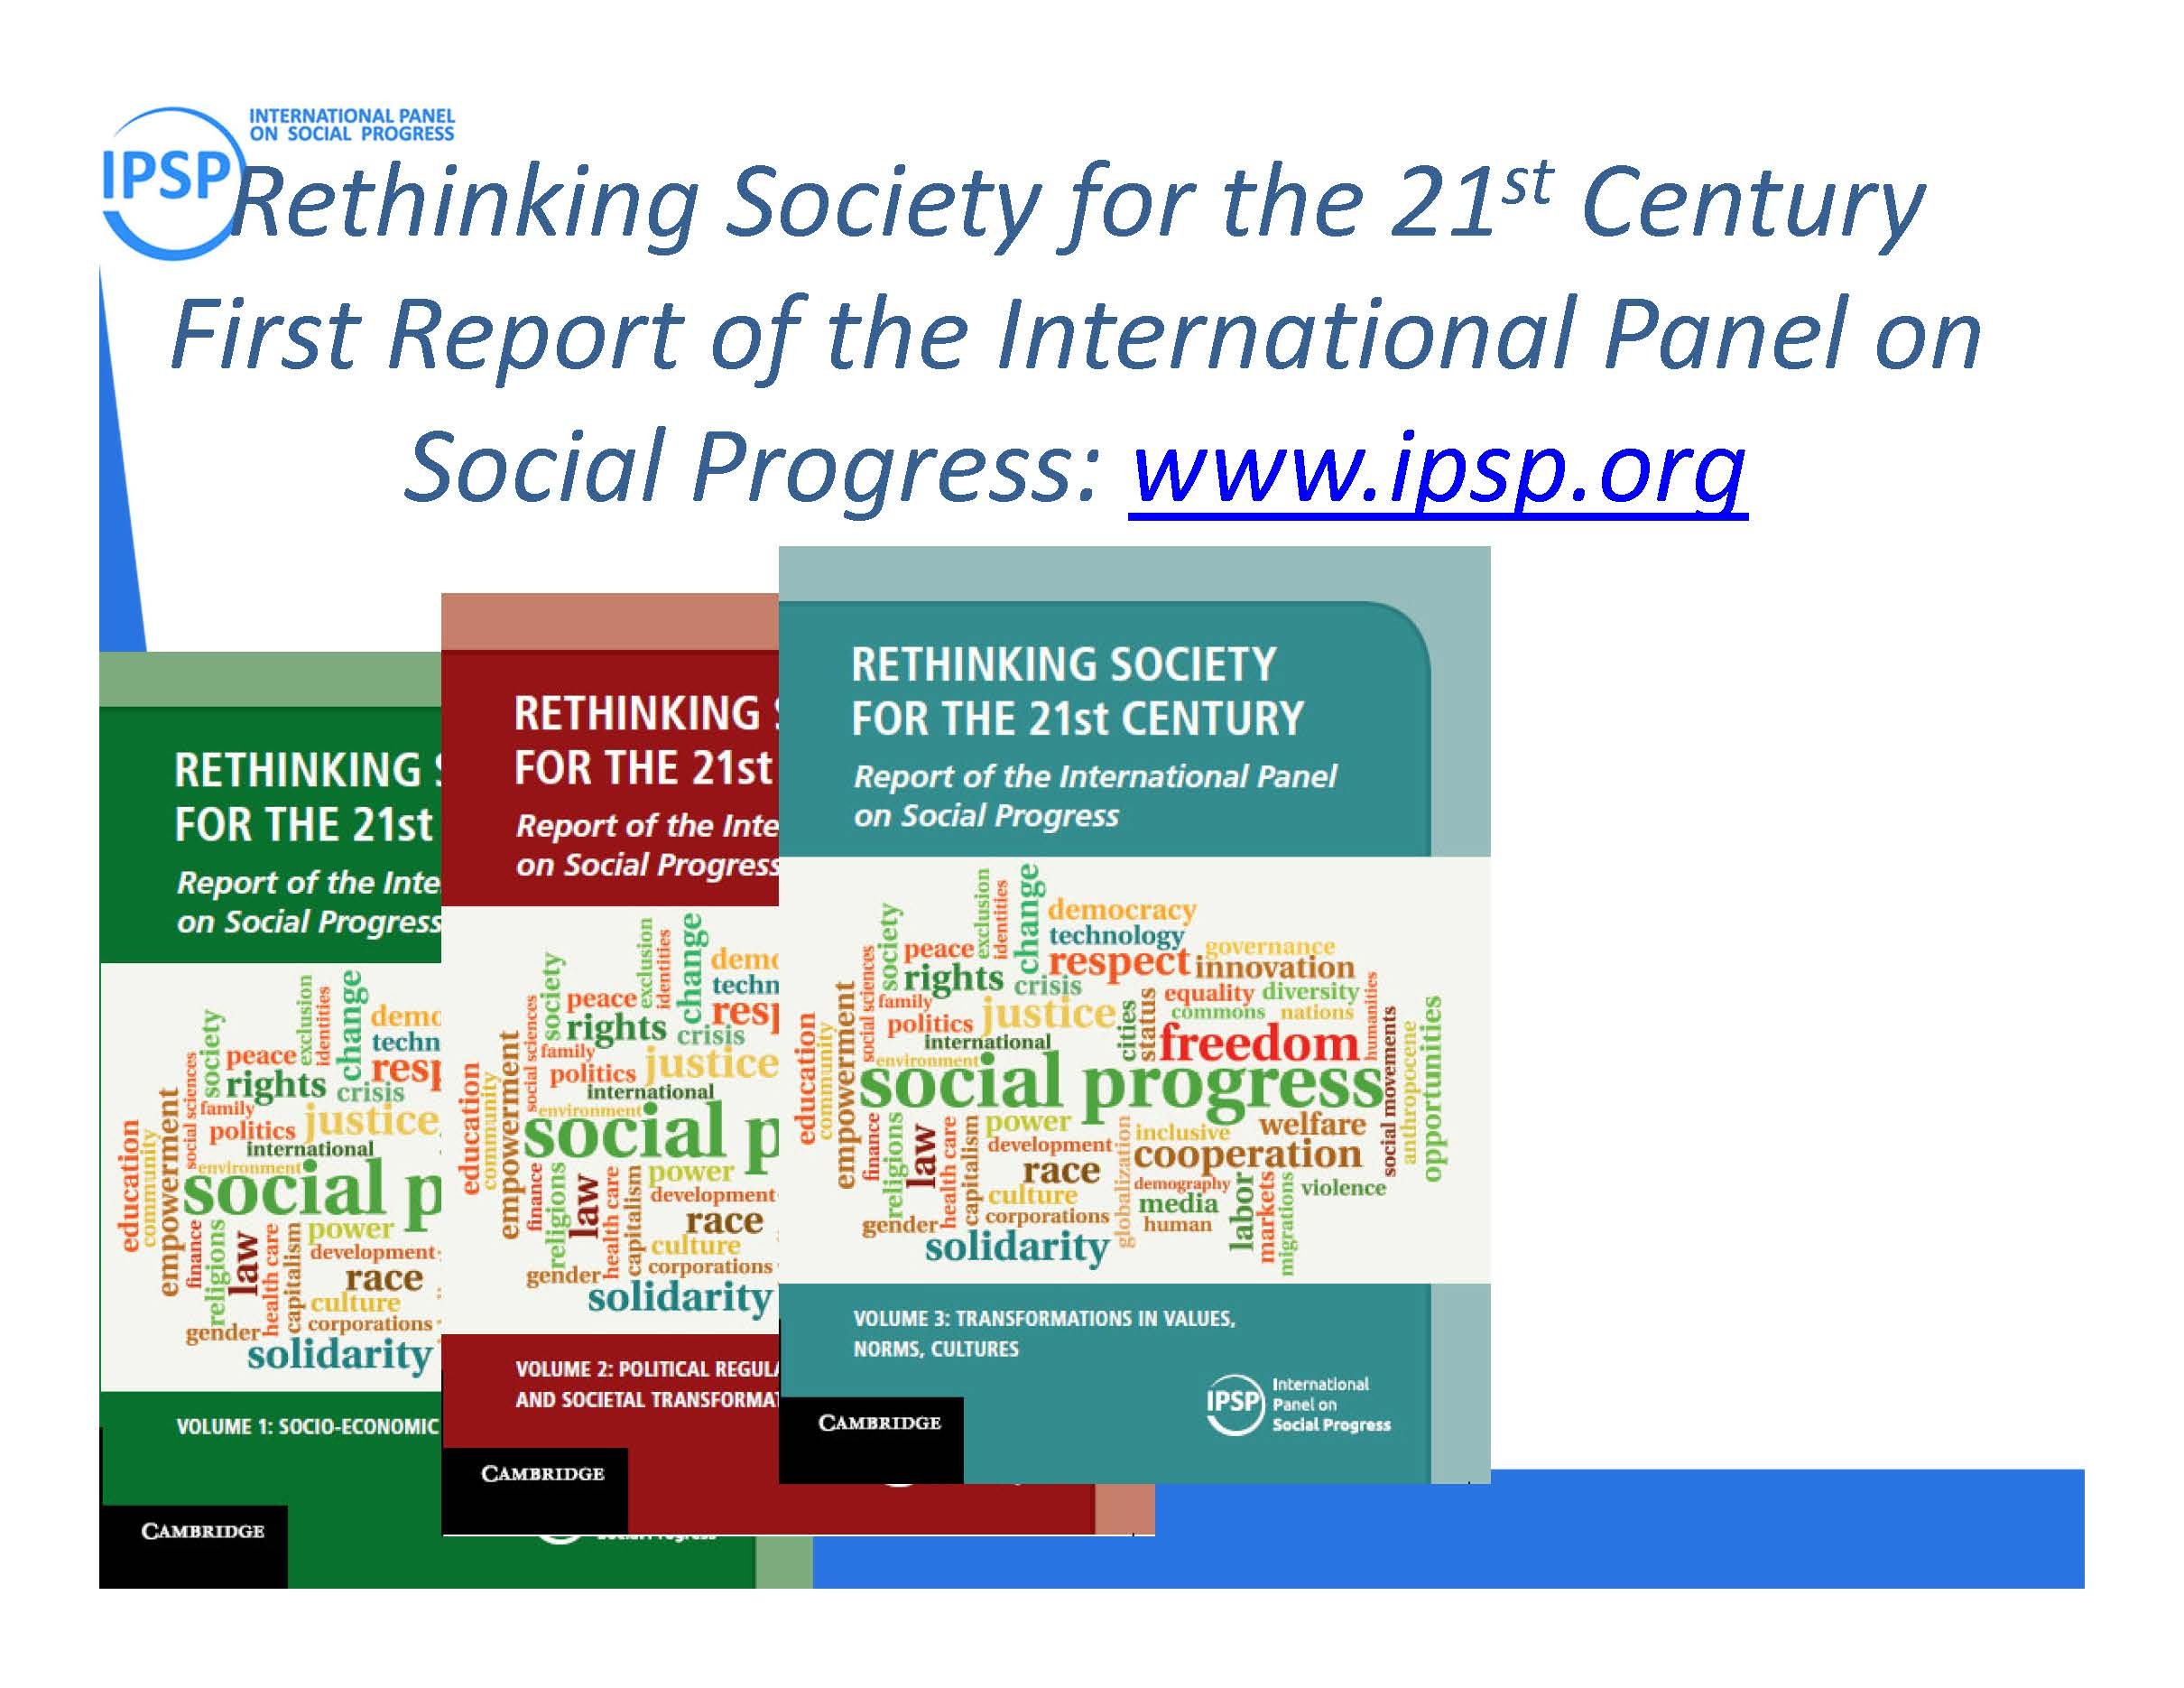 063-Rethinking Scoiety for the Twenty First Century.jpg